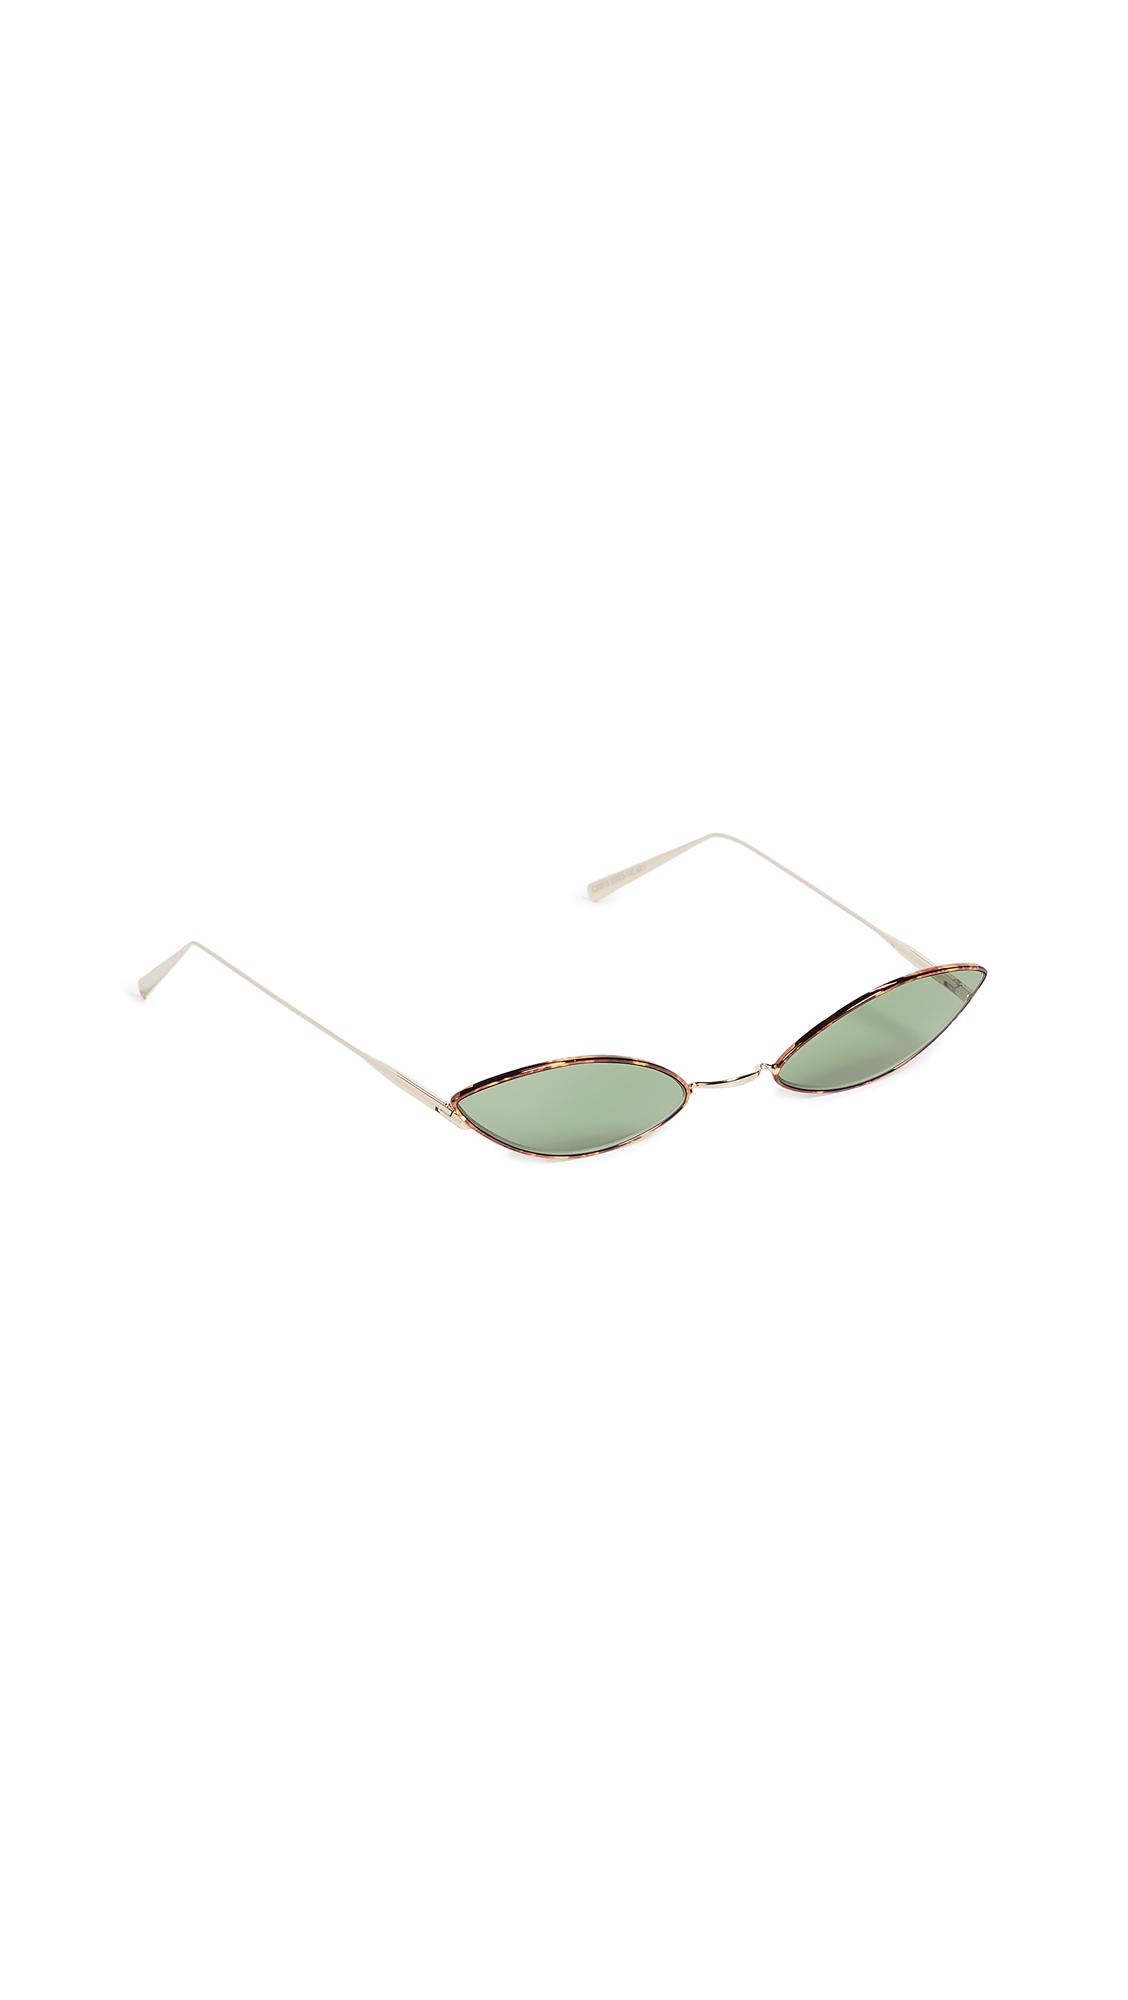 Acne Studios Astaria Print Sunglasses - Tortoise/Green